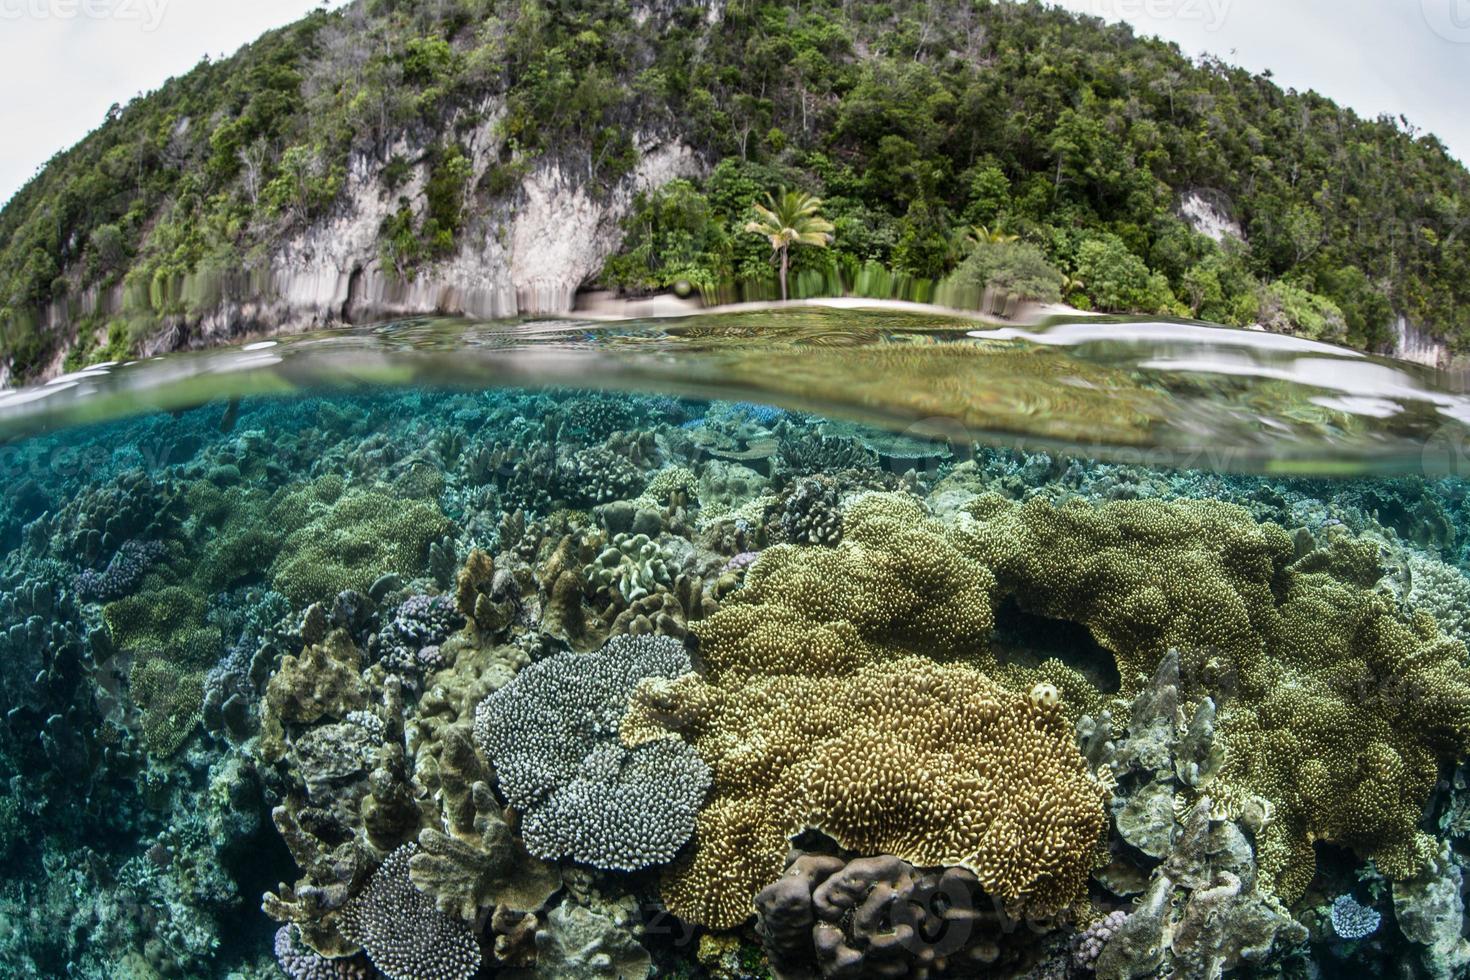 korallrev nära kalkstenön foto